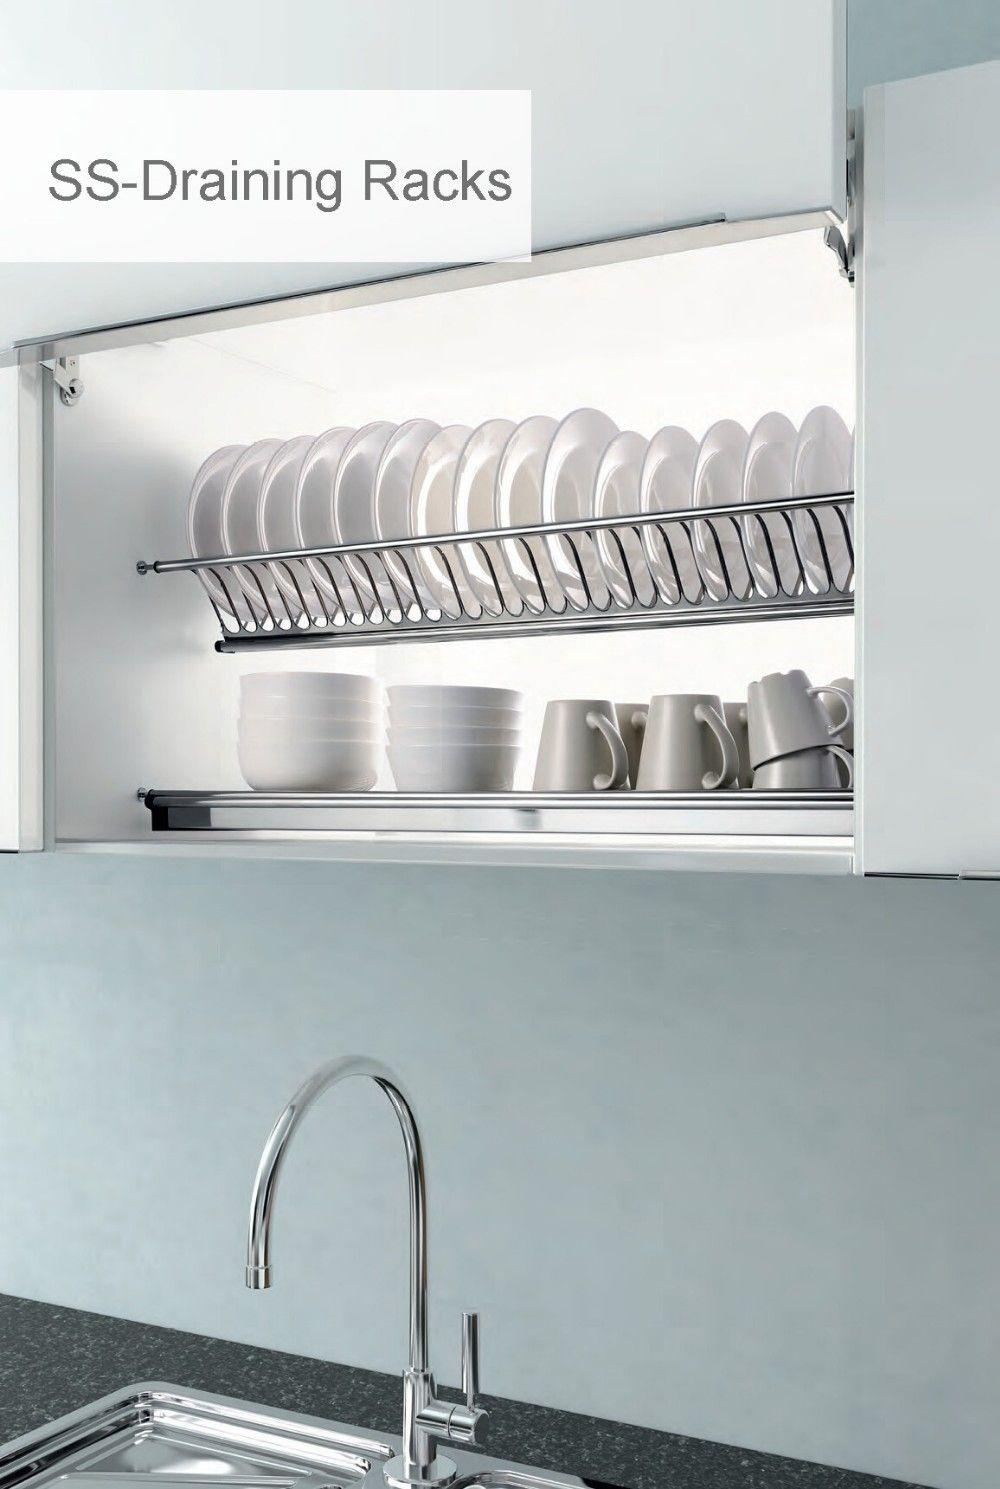 2018kitchen Sink Stainless Steel Dish Drainer Designs De Cozinha Moveis Planejados Cozinha Cozinhas Modernas